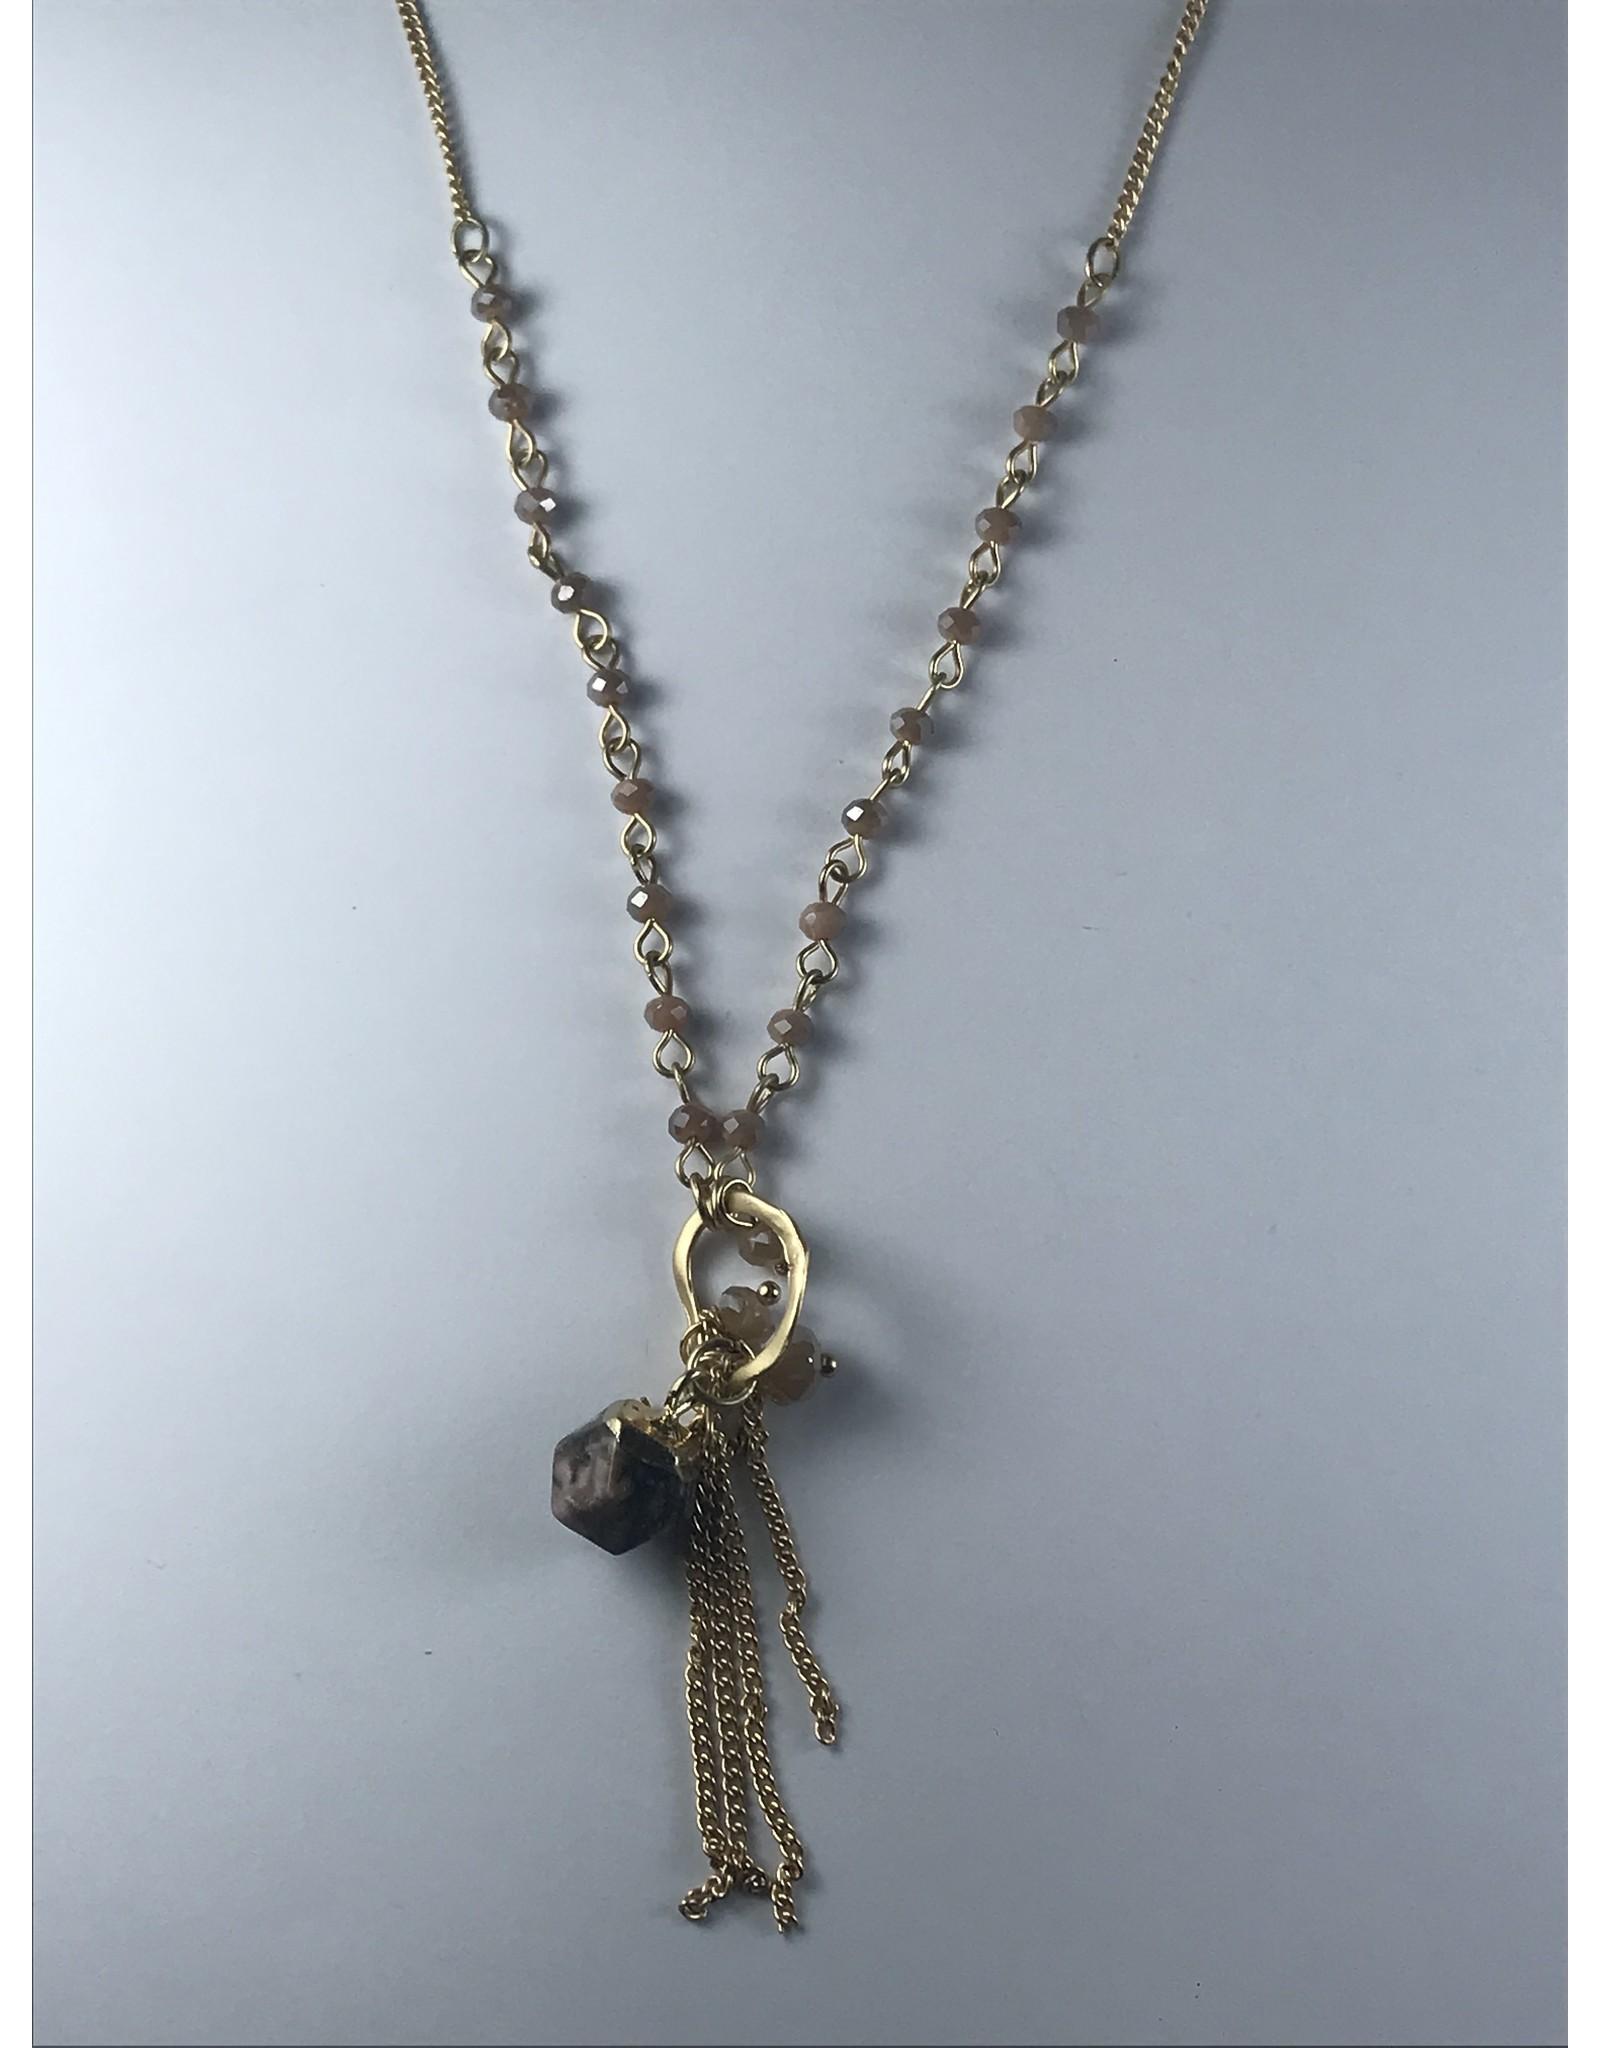 Axxes-Soir korte  fijne goudkleurige ketting met natureltinten -  bolletjes